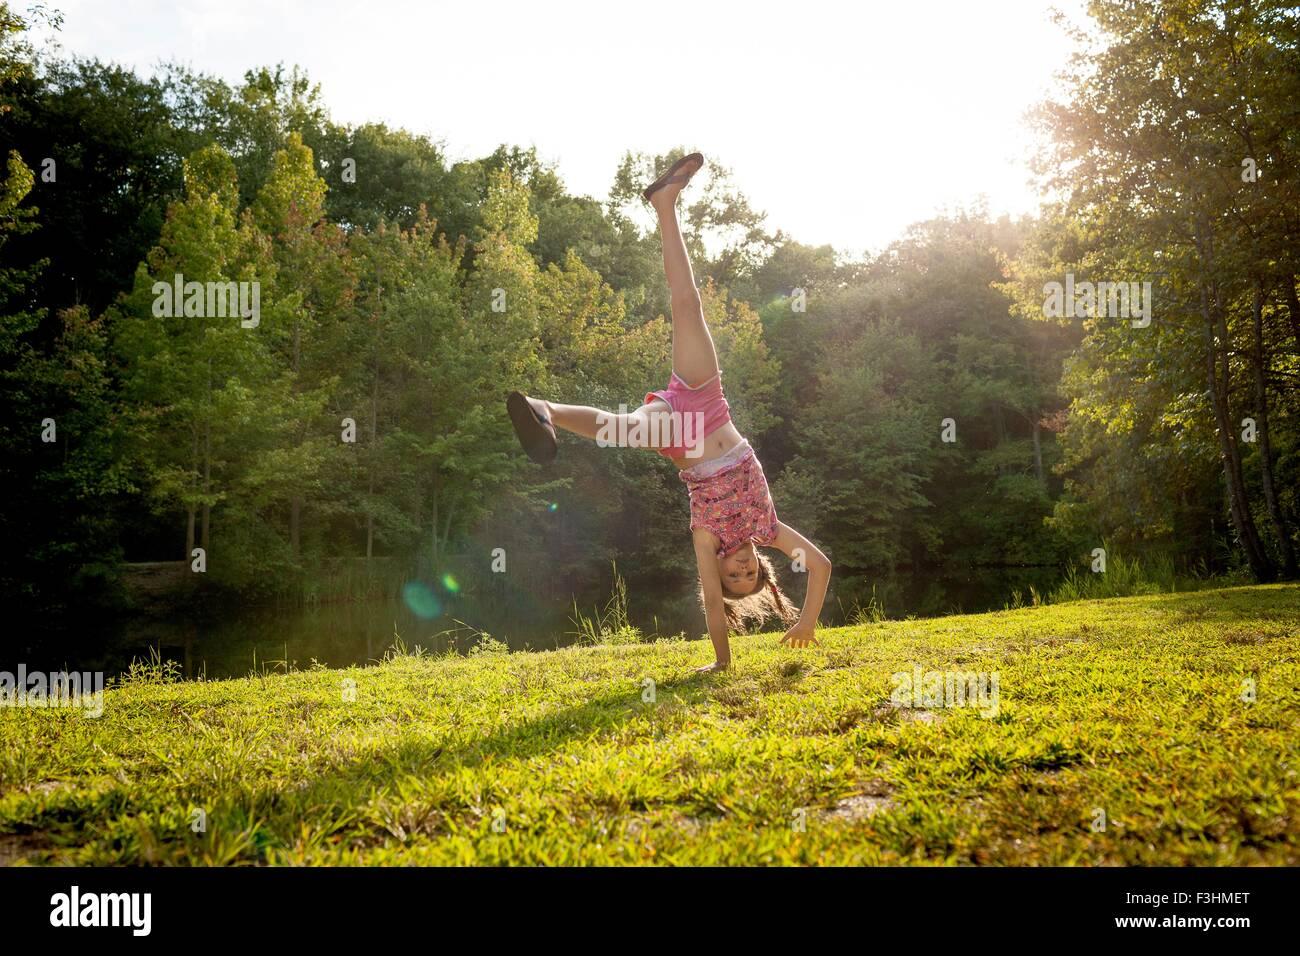 Girl upside down doing cartwheel looking at camera - Stock Image